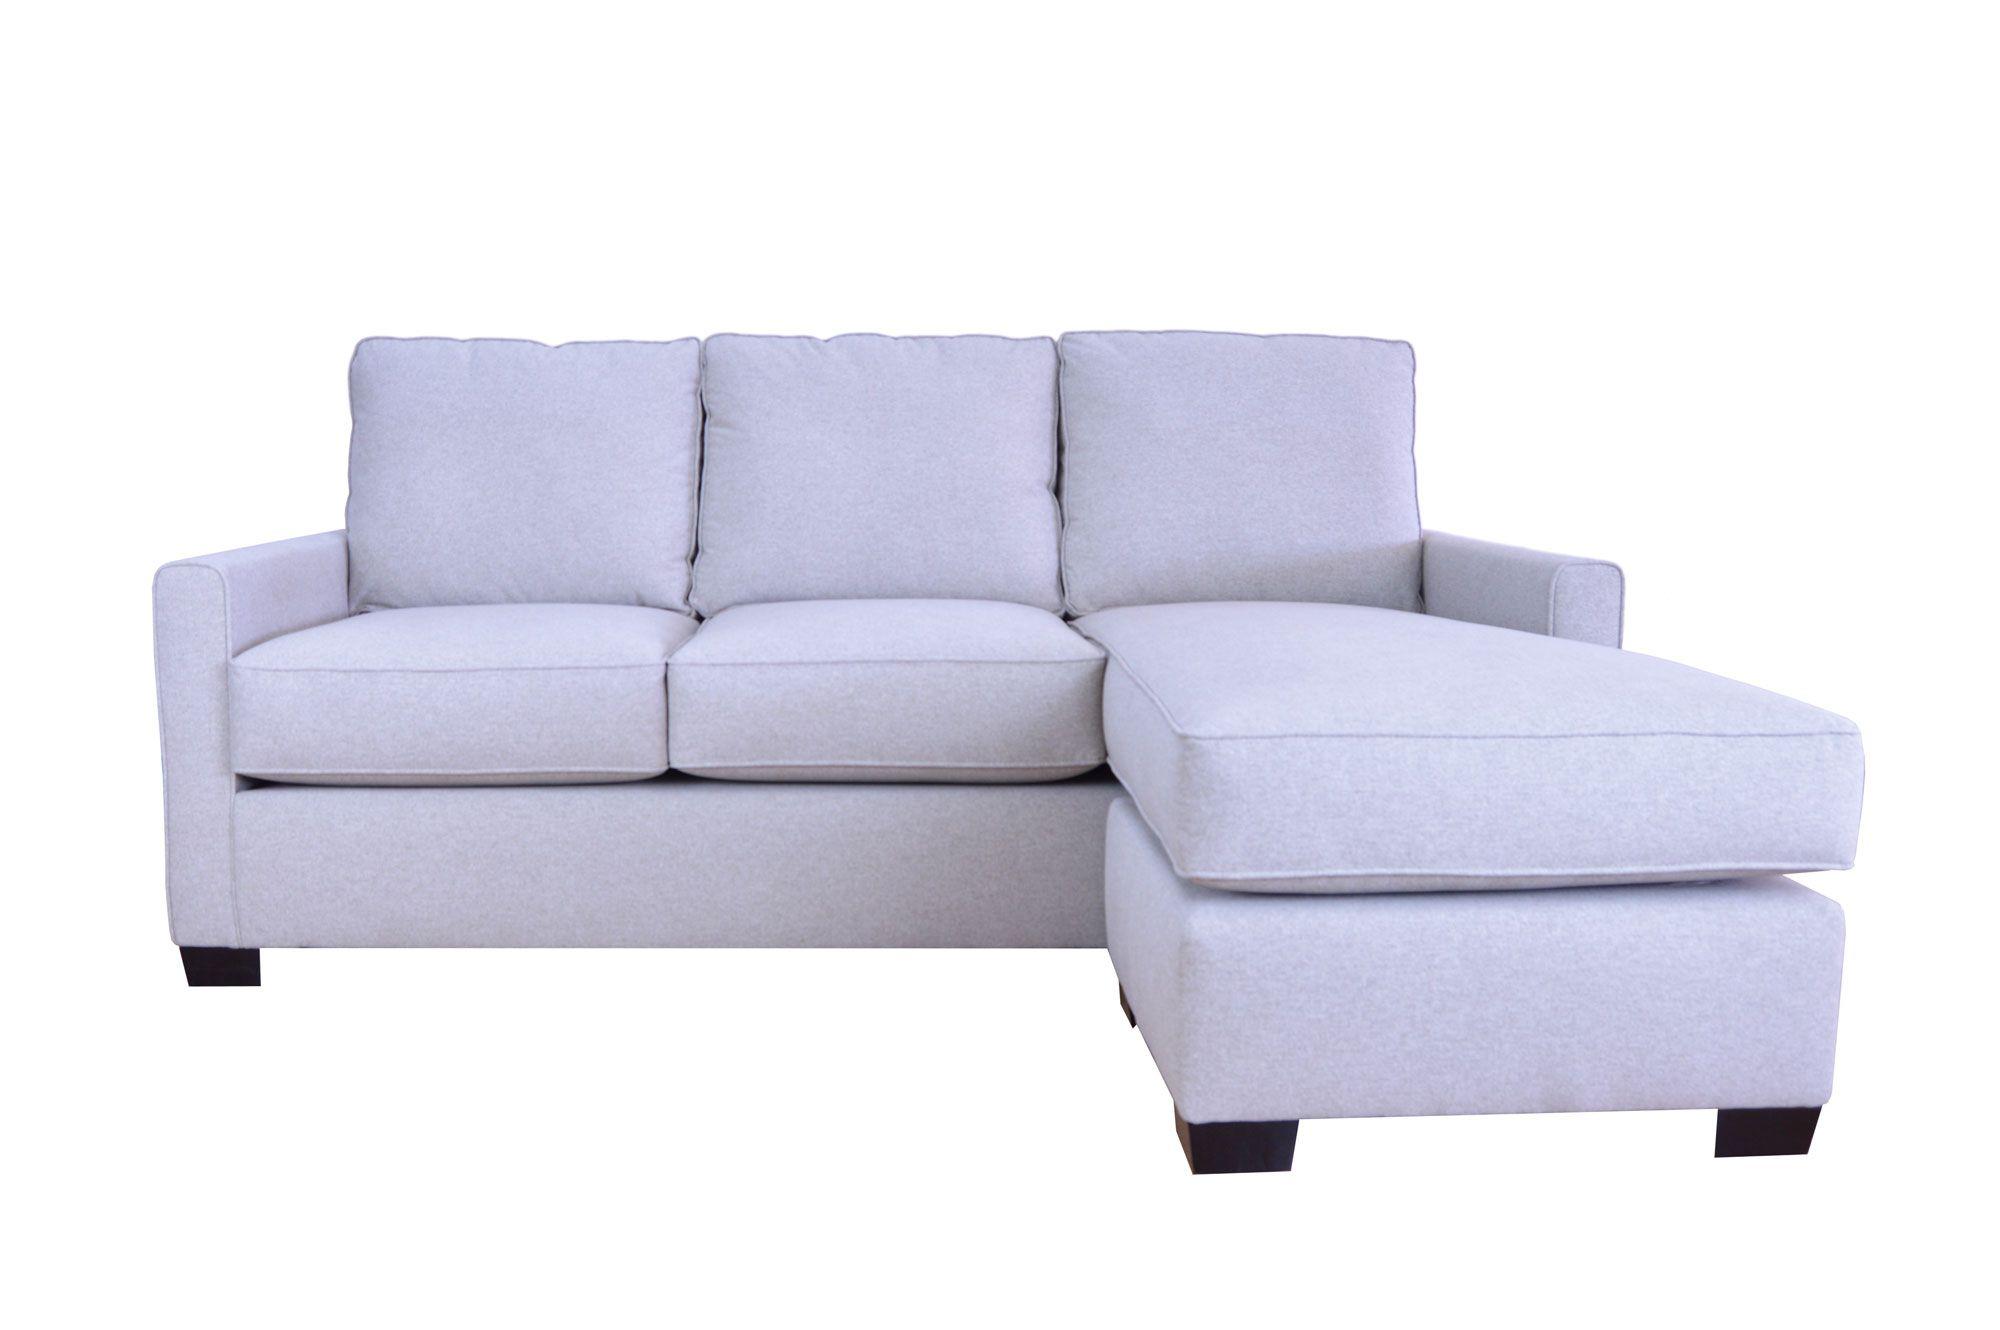 San Leandro Custom Sofas 4 Less